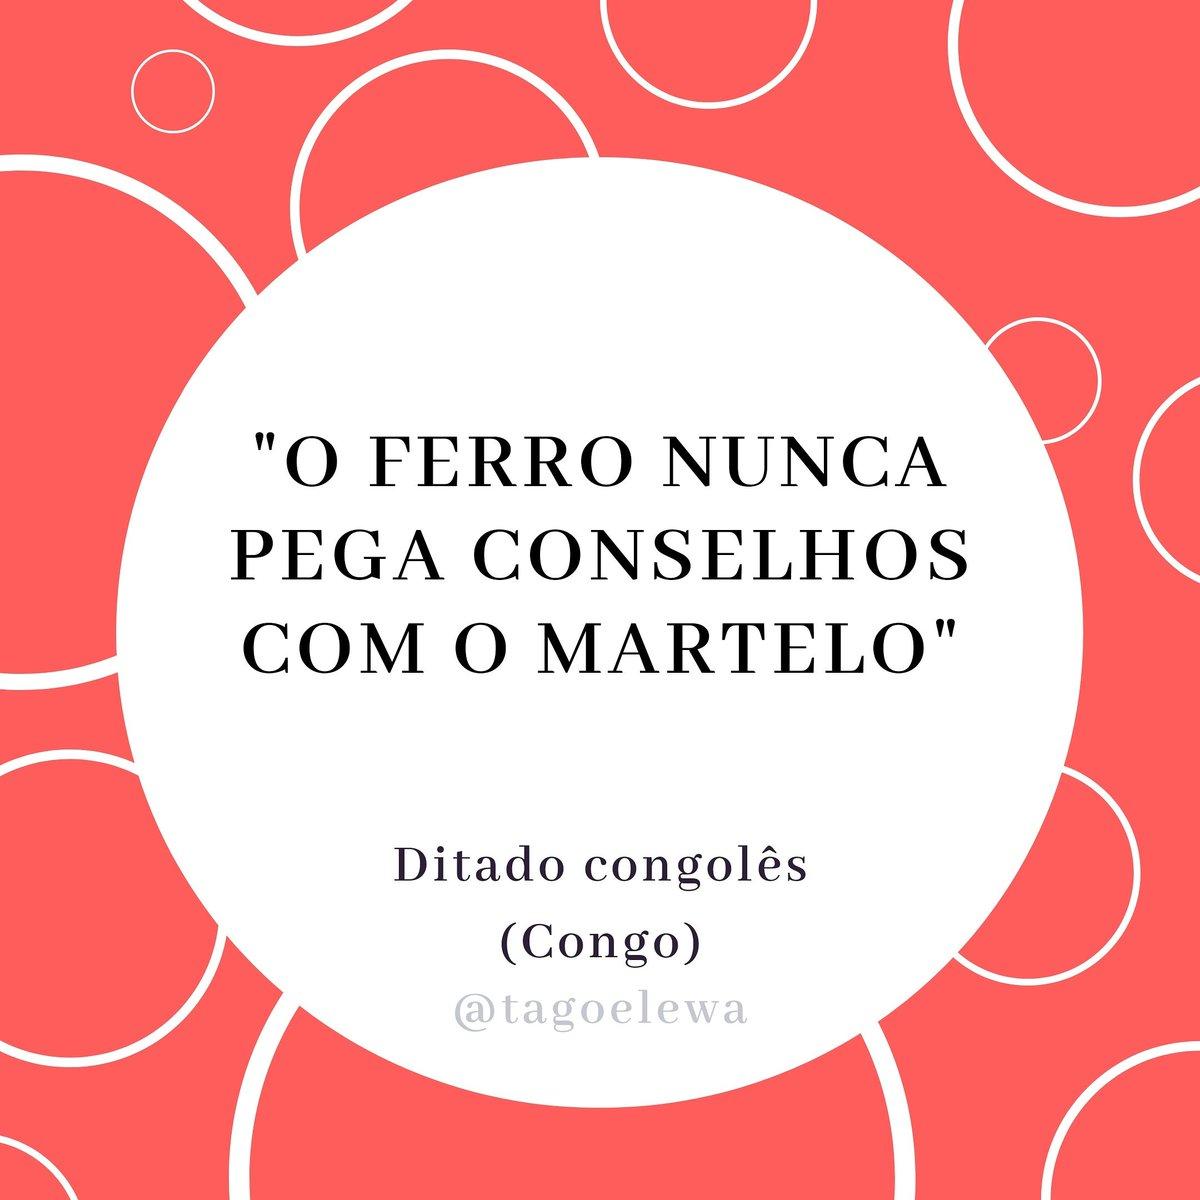 _____________________ #provérbiosdesexta #proverbs #provérbios #ditados #ditopopular #africanproverb #africa #afrika #Congo #Kongo #sayings #africanpeople #africanculture https://t.co/sjaxU9awEB